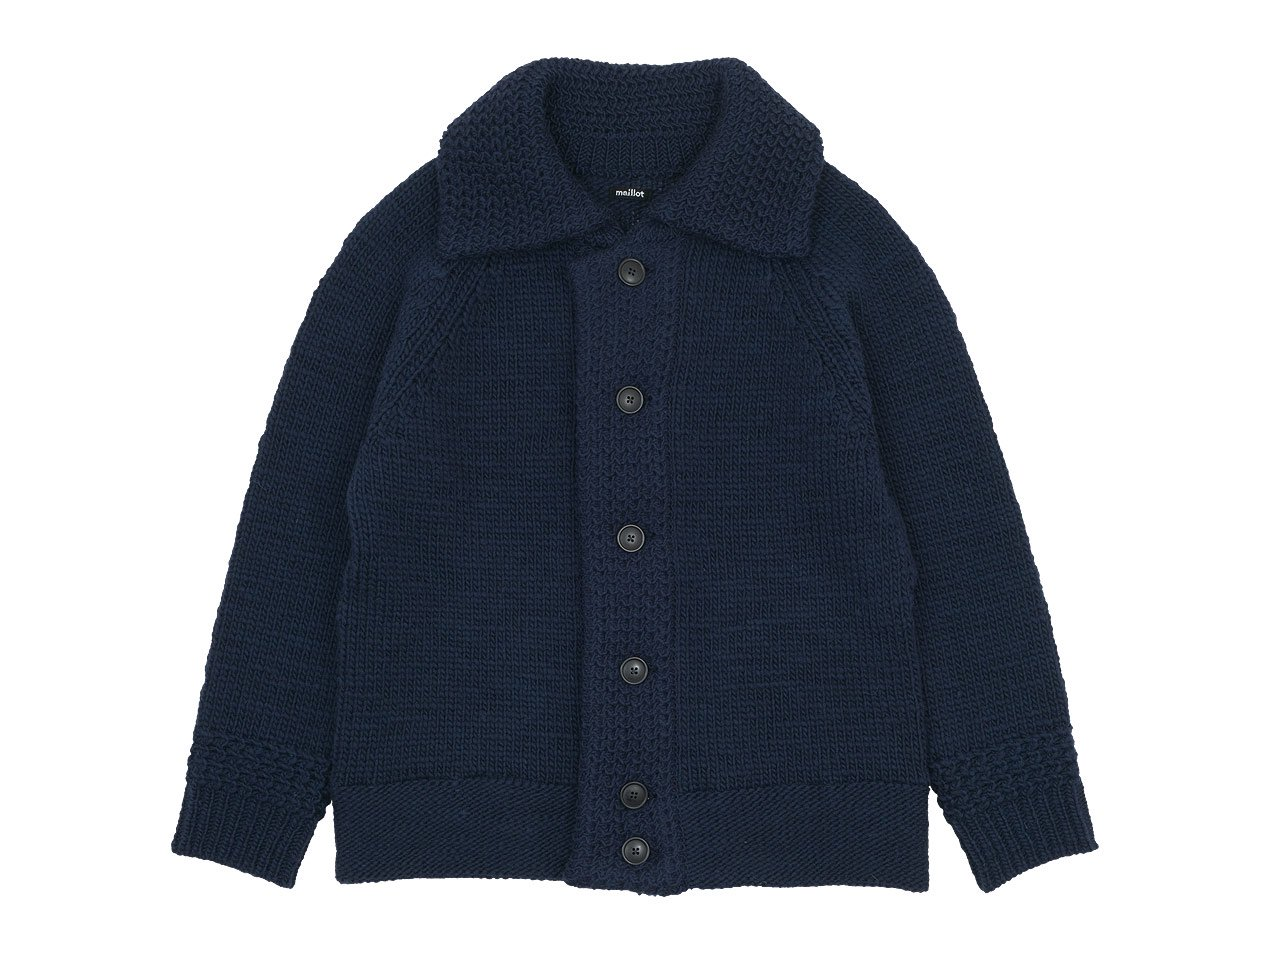 maillot mature hand frame fisherman jacket NAVY